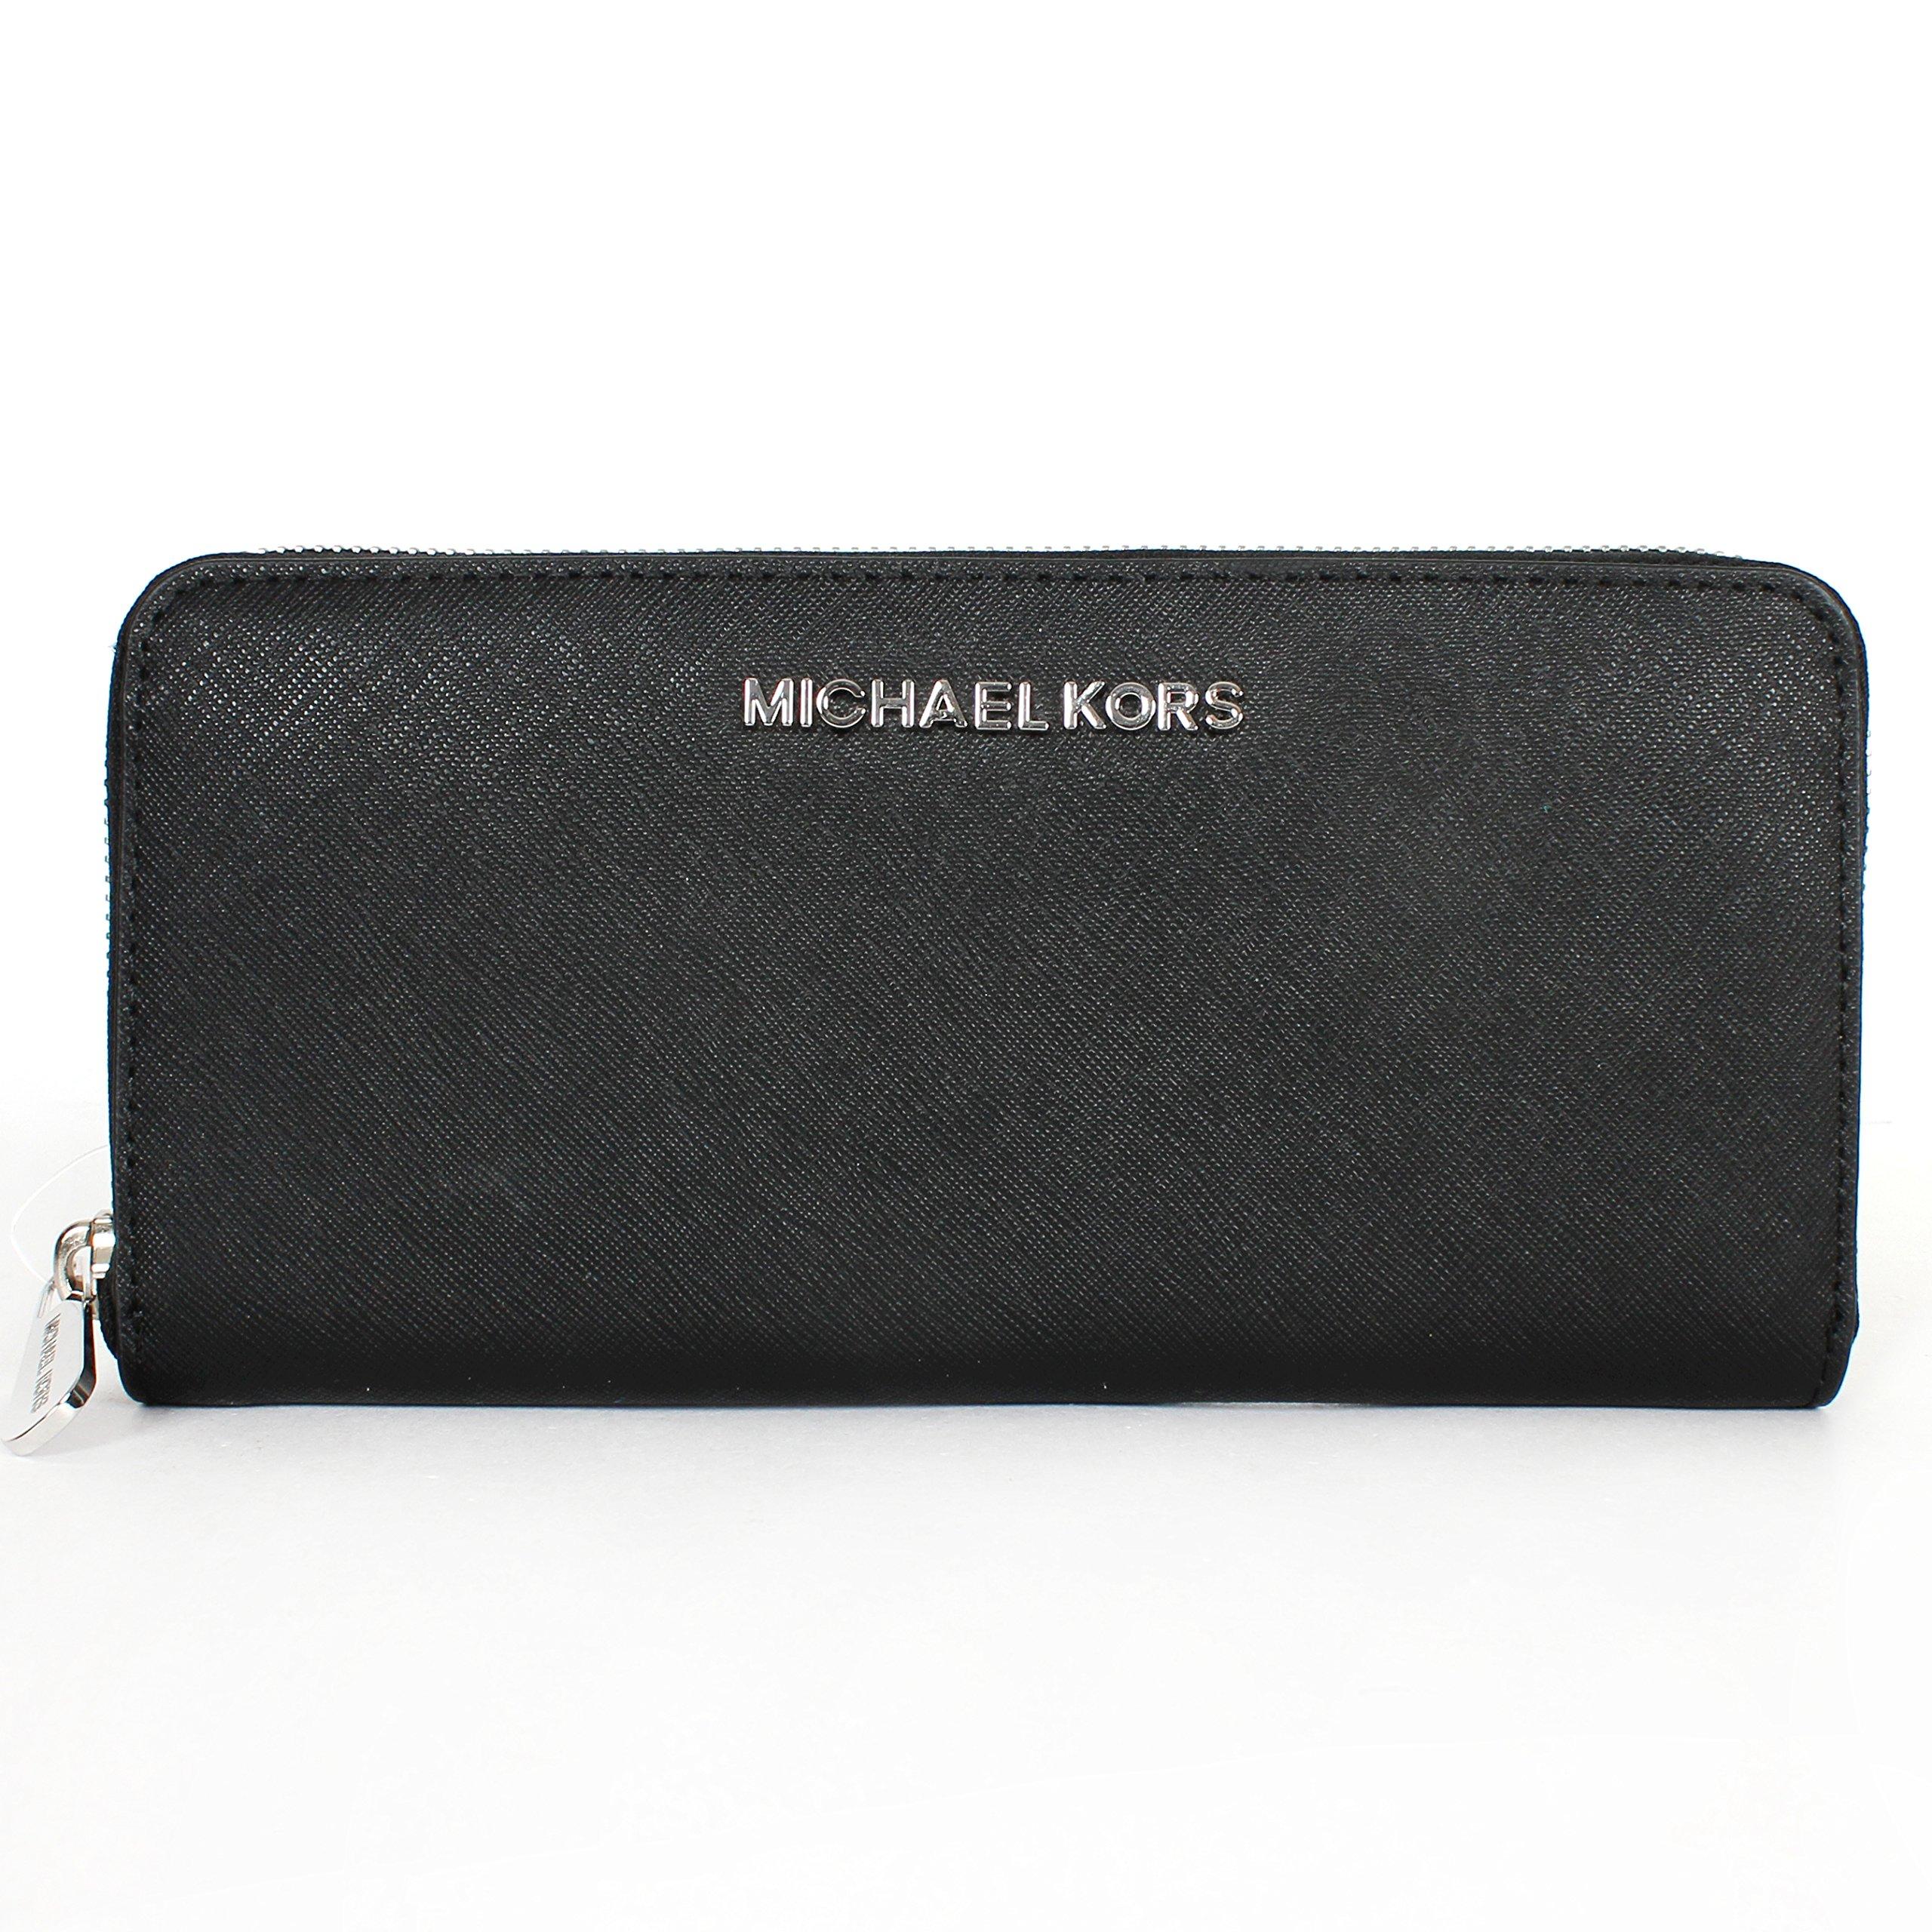 Michael Kors Jet Set Travel Zip Around Continental Wallet Silver/black